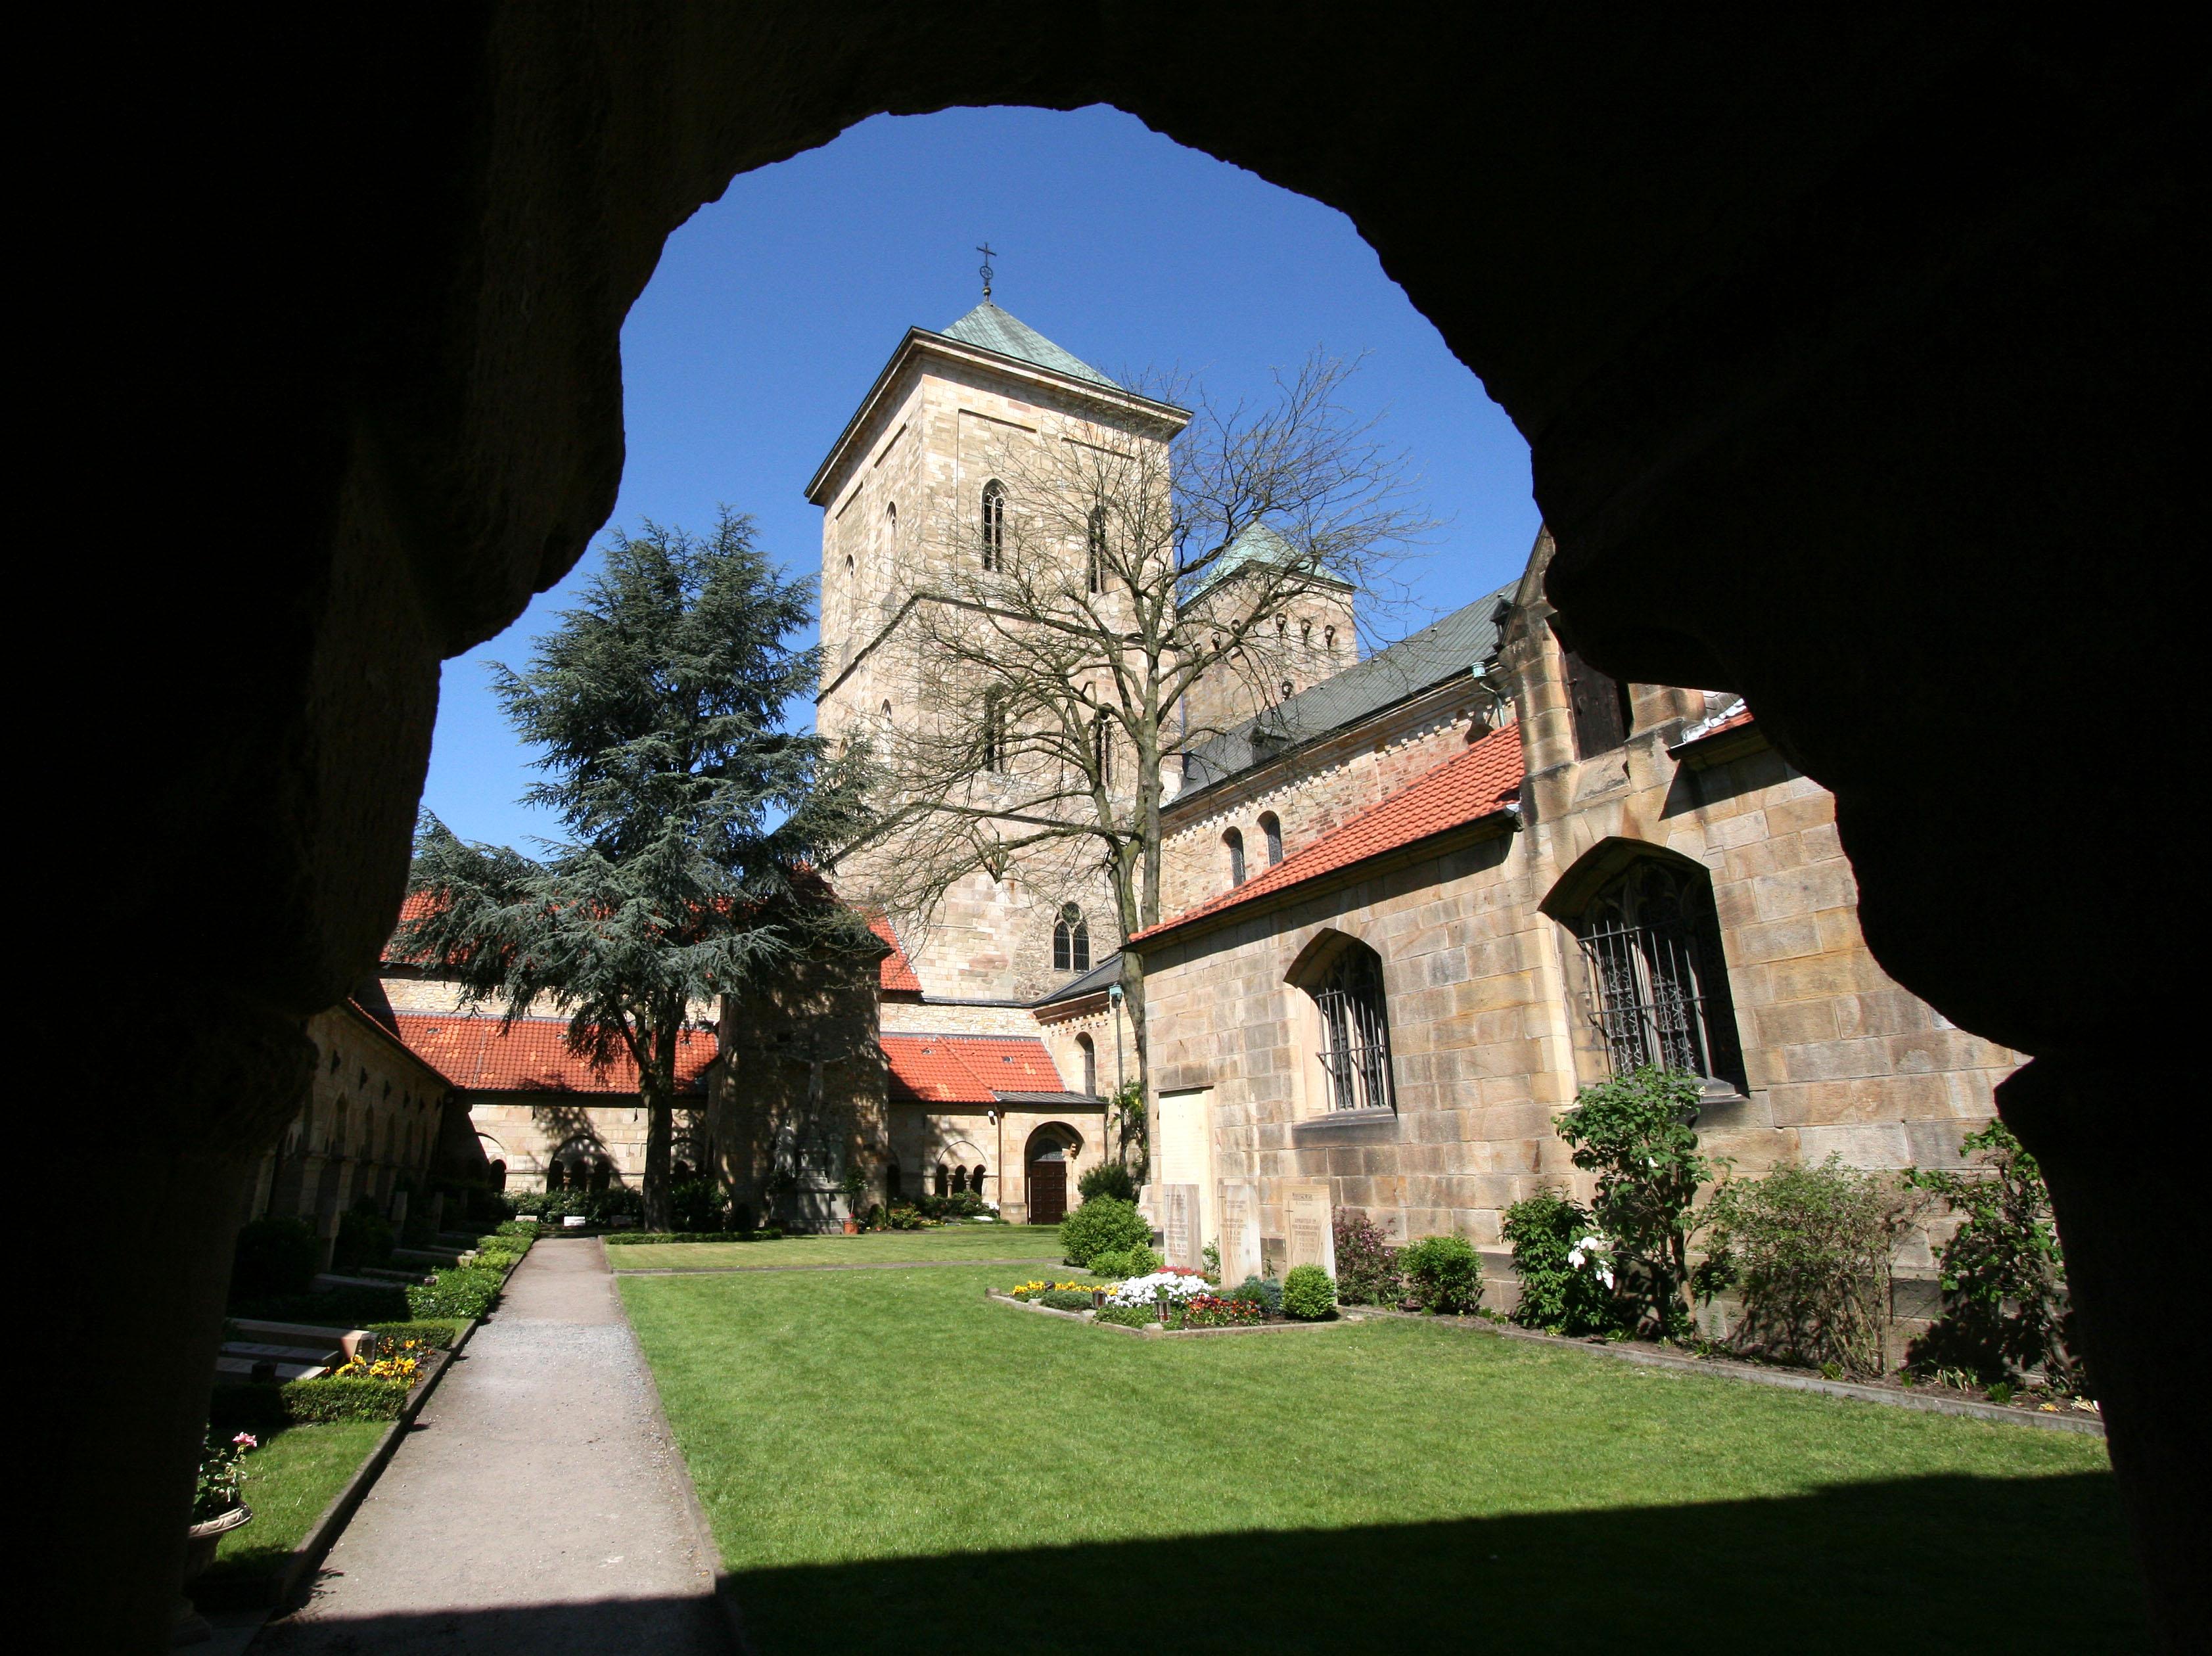 Domherrenfriedhof Osnabrück